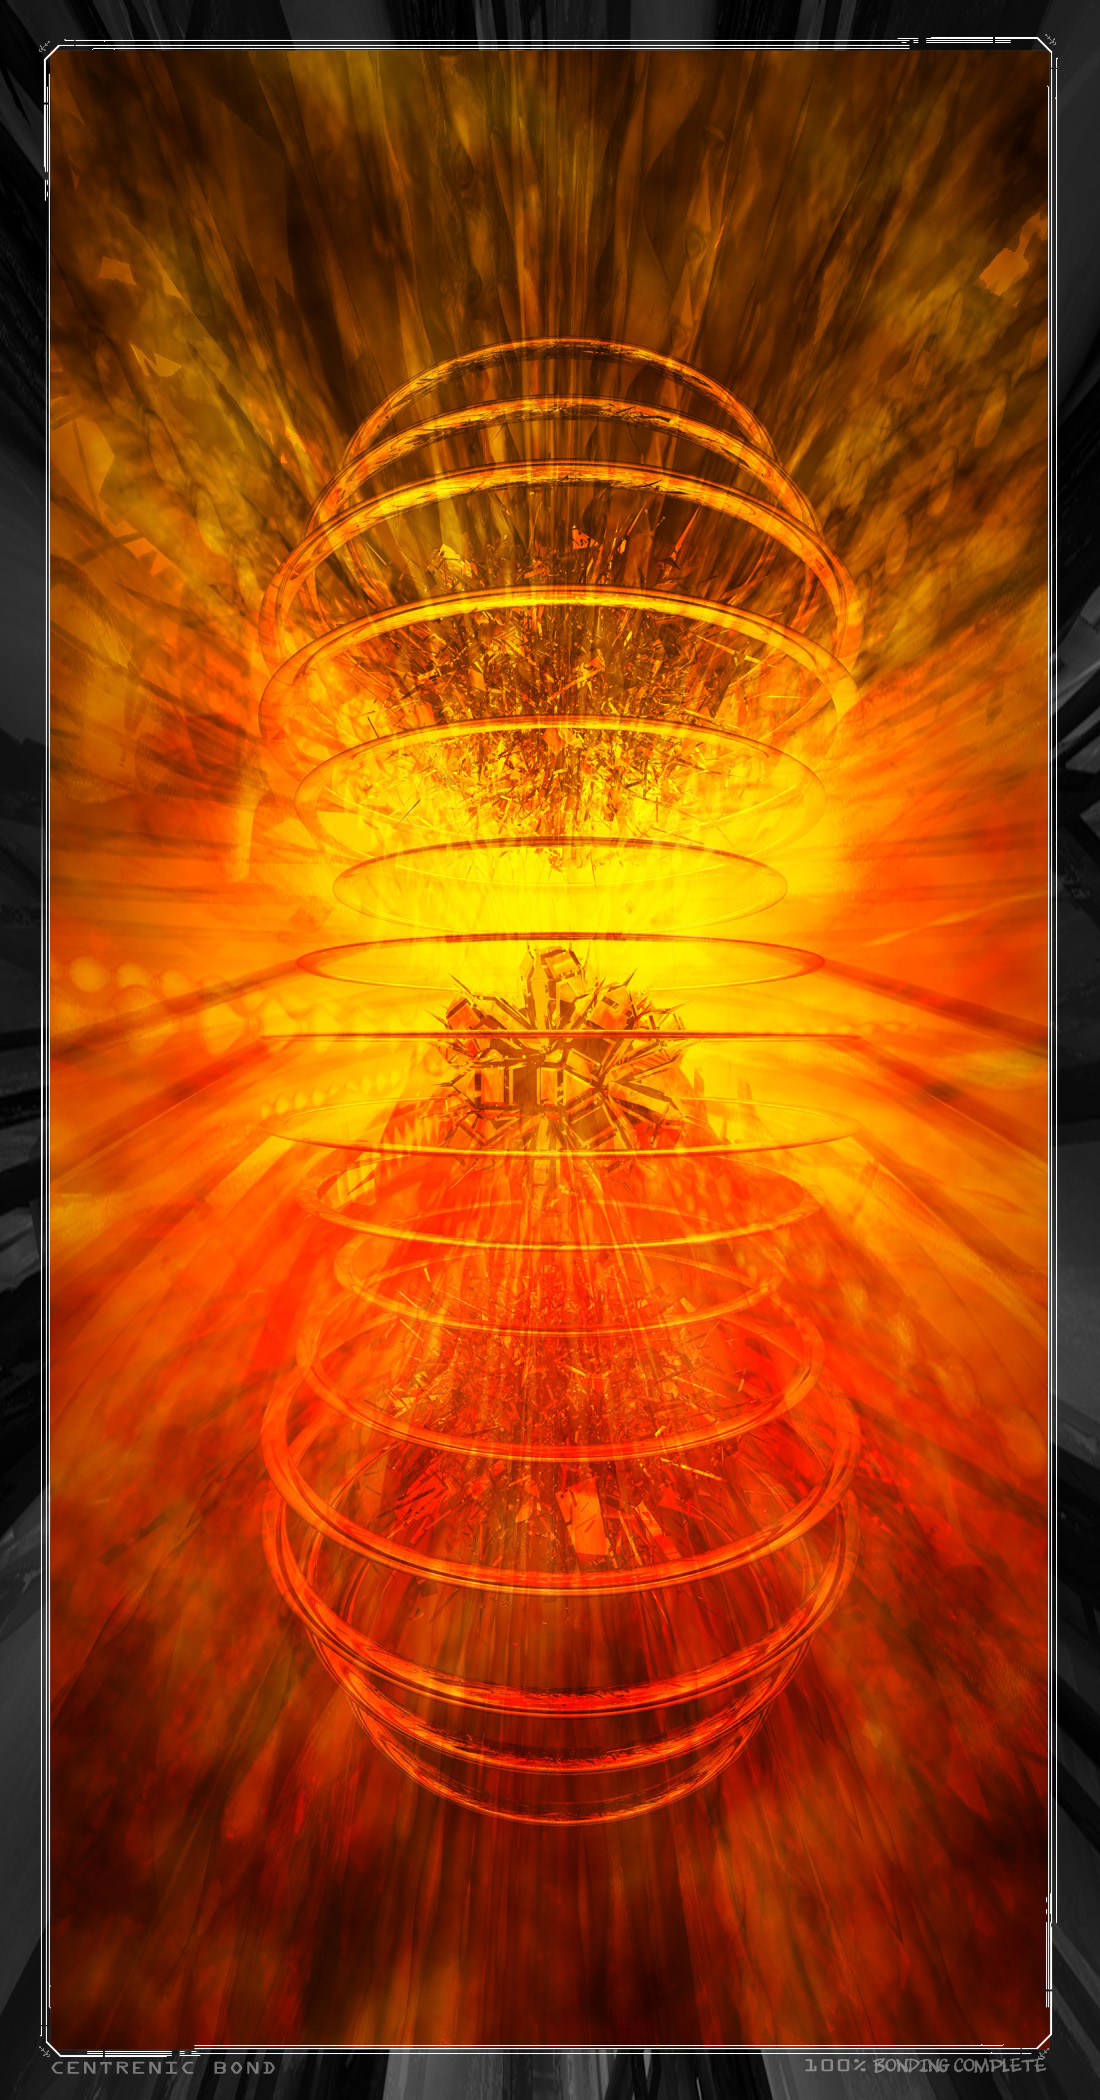 .-'Centrenic Bond'-, by xgod-0